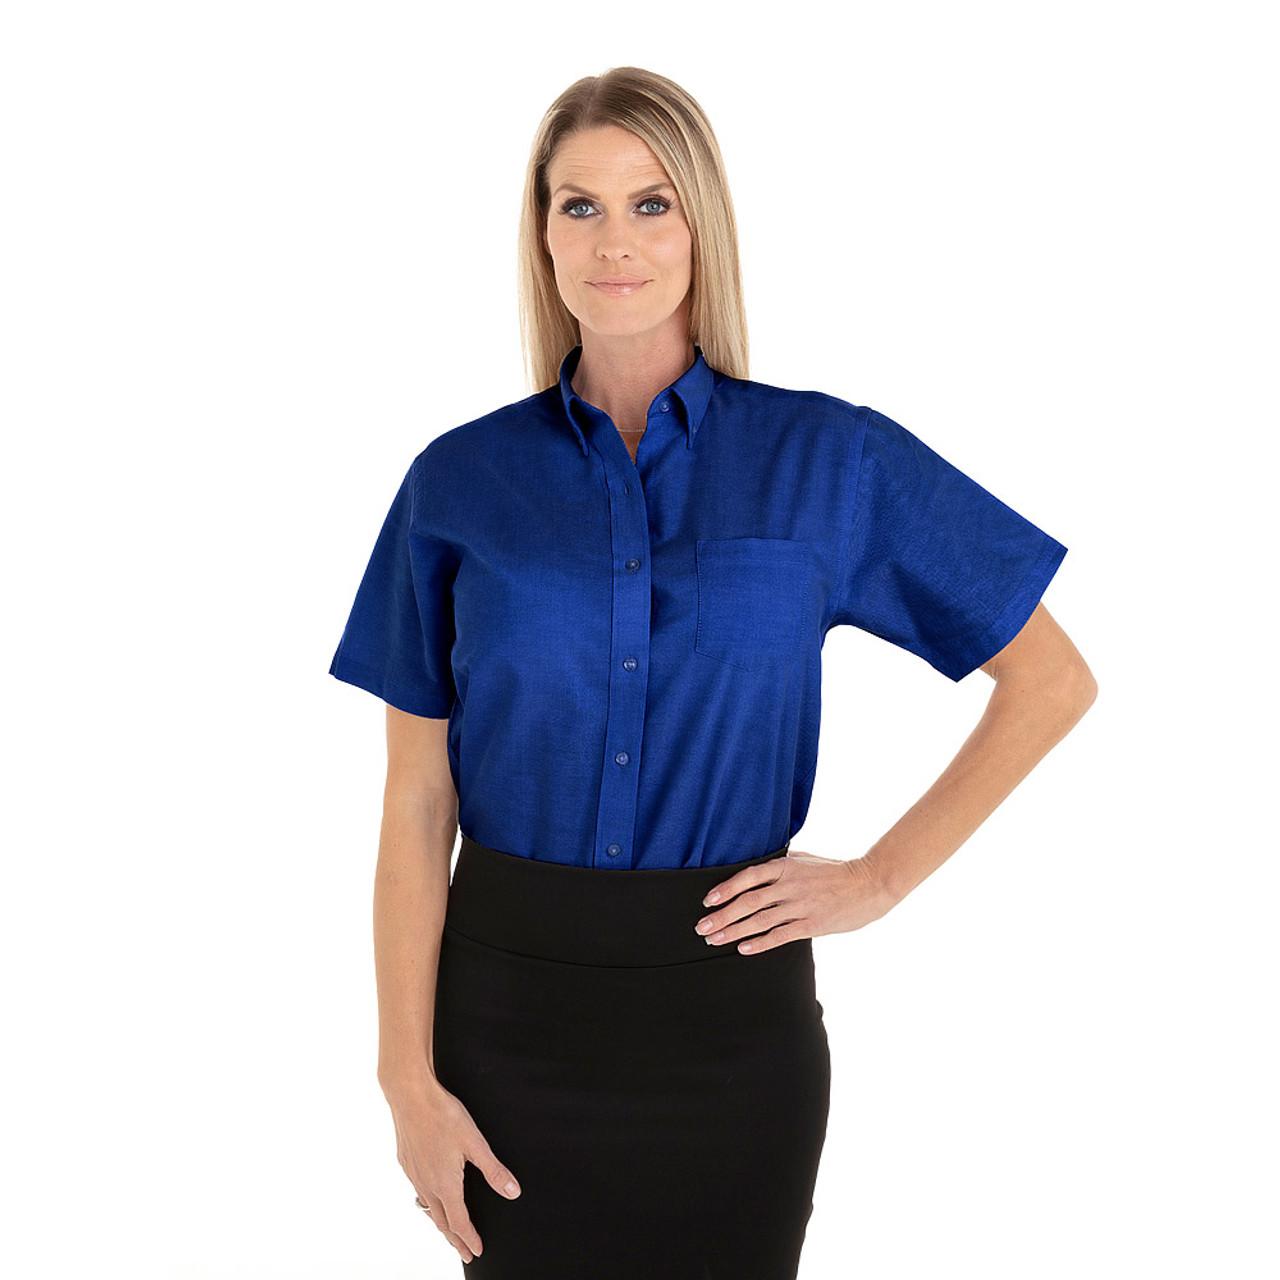 French Blue - 18CV301 Van Heusen Ladies' Short Sleeve Oxford Shirt -T-shirt.ca